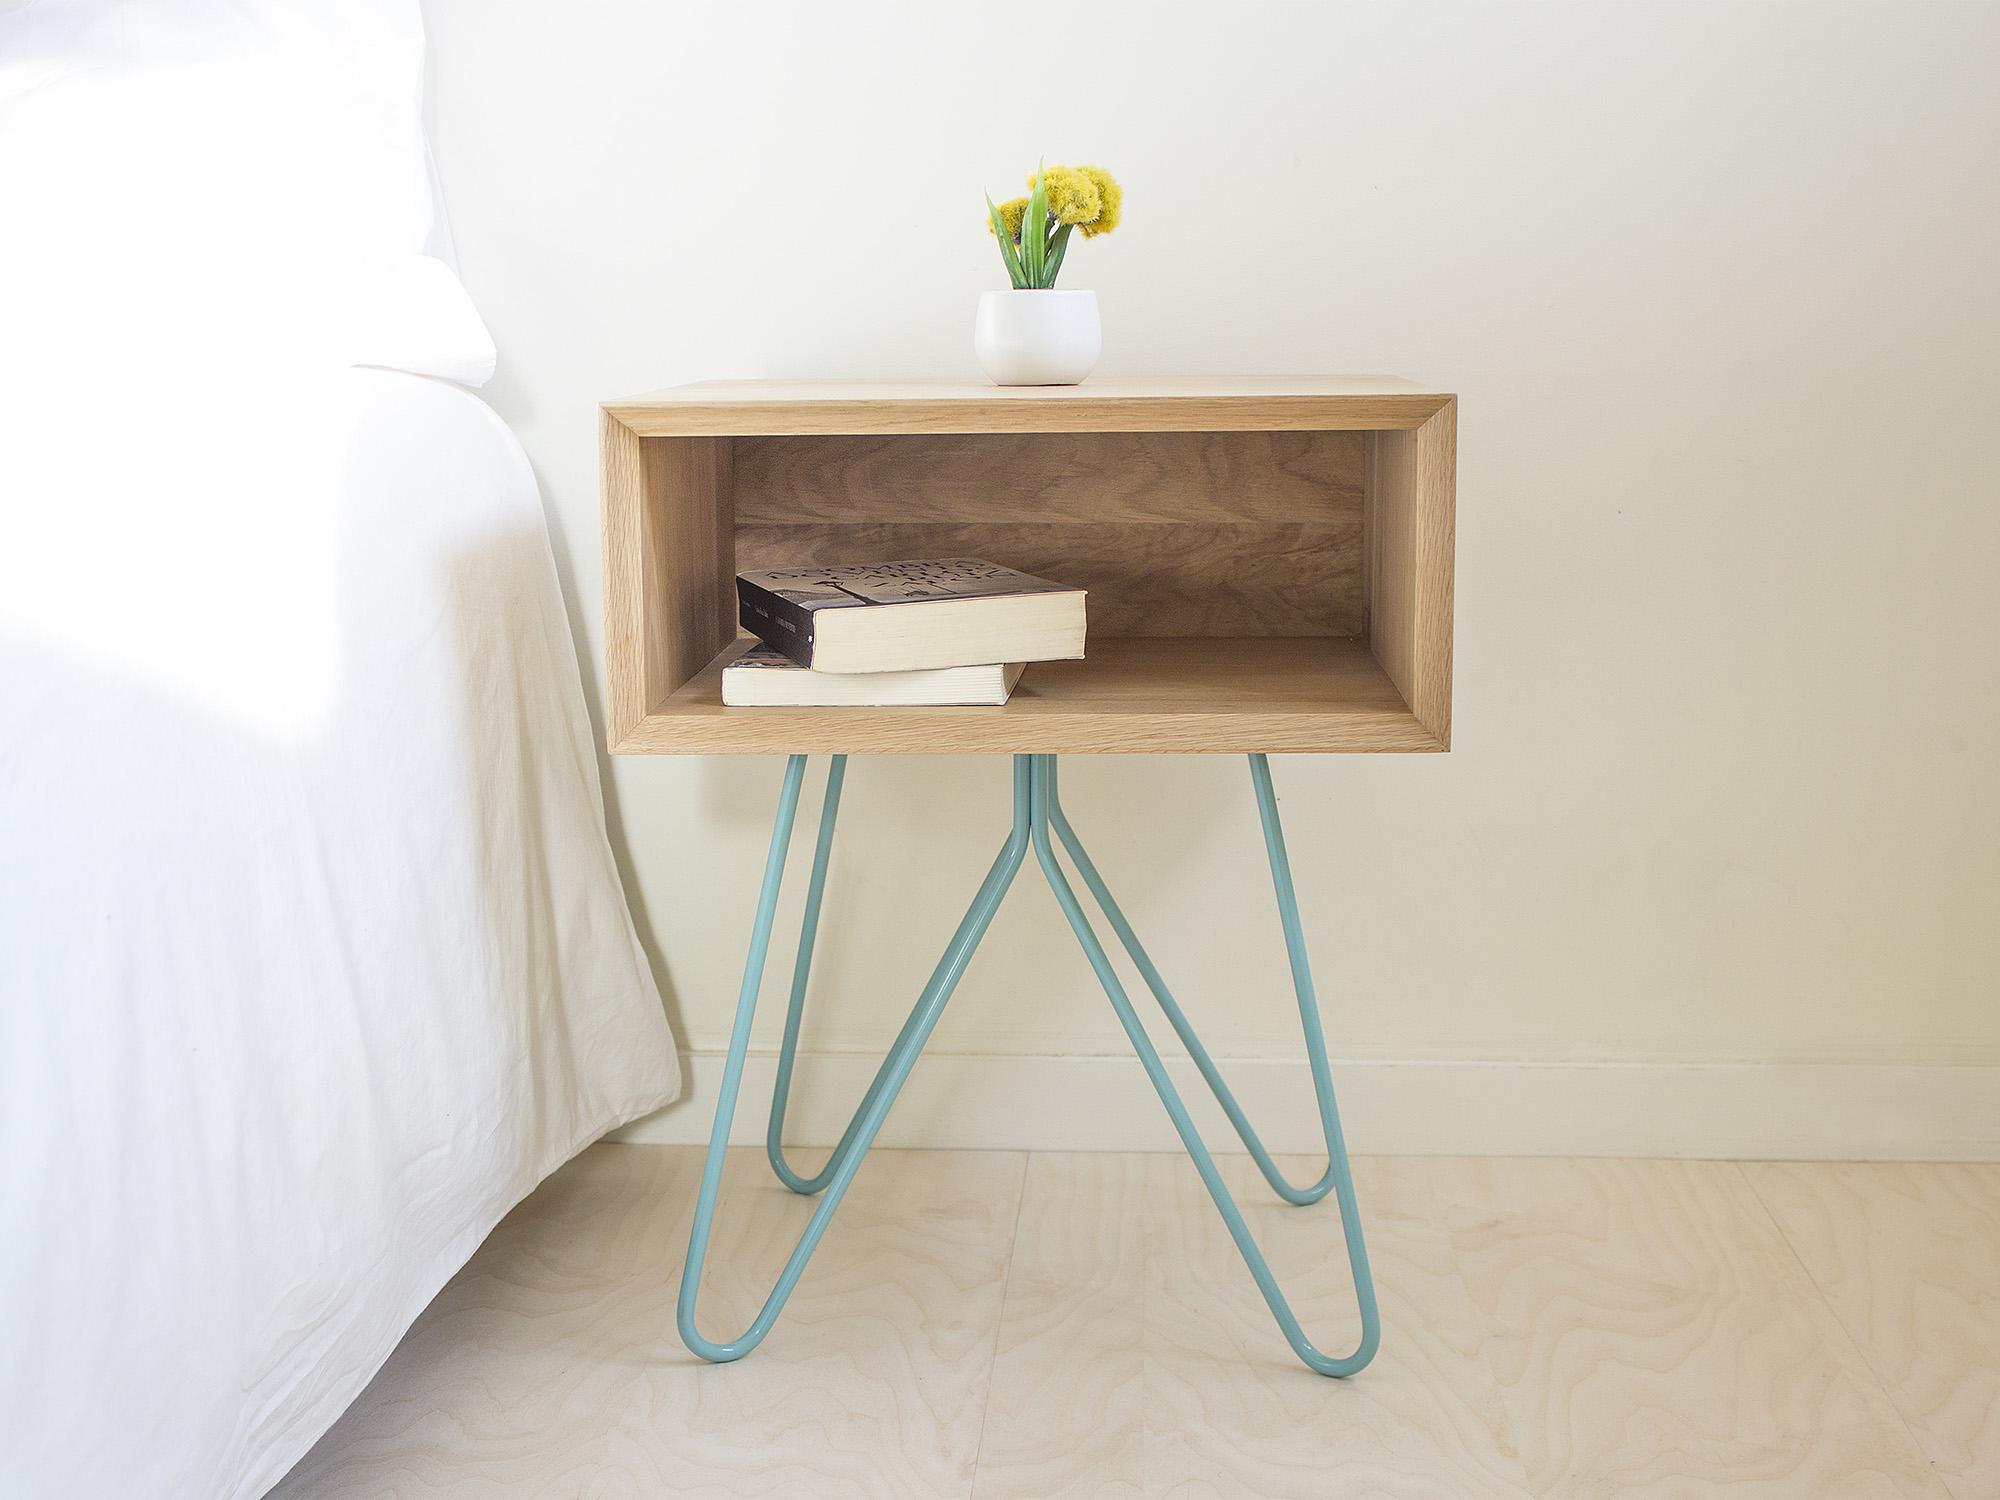 Galula | Nove side table, blue legs